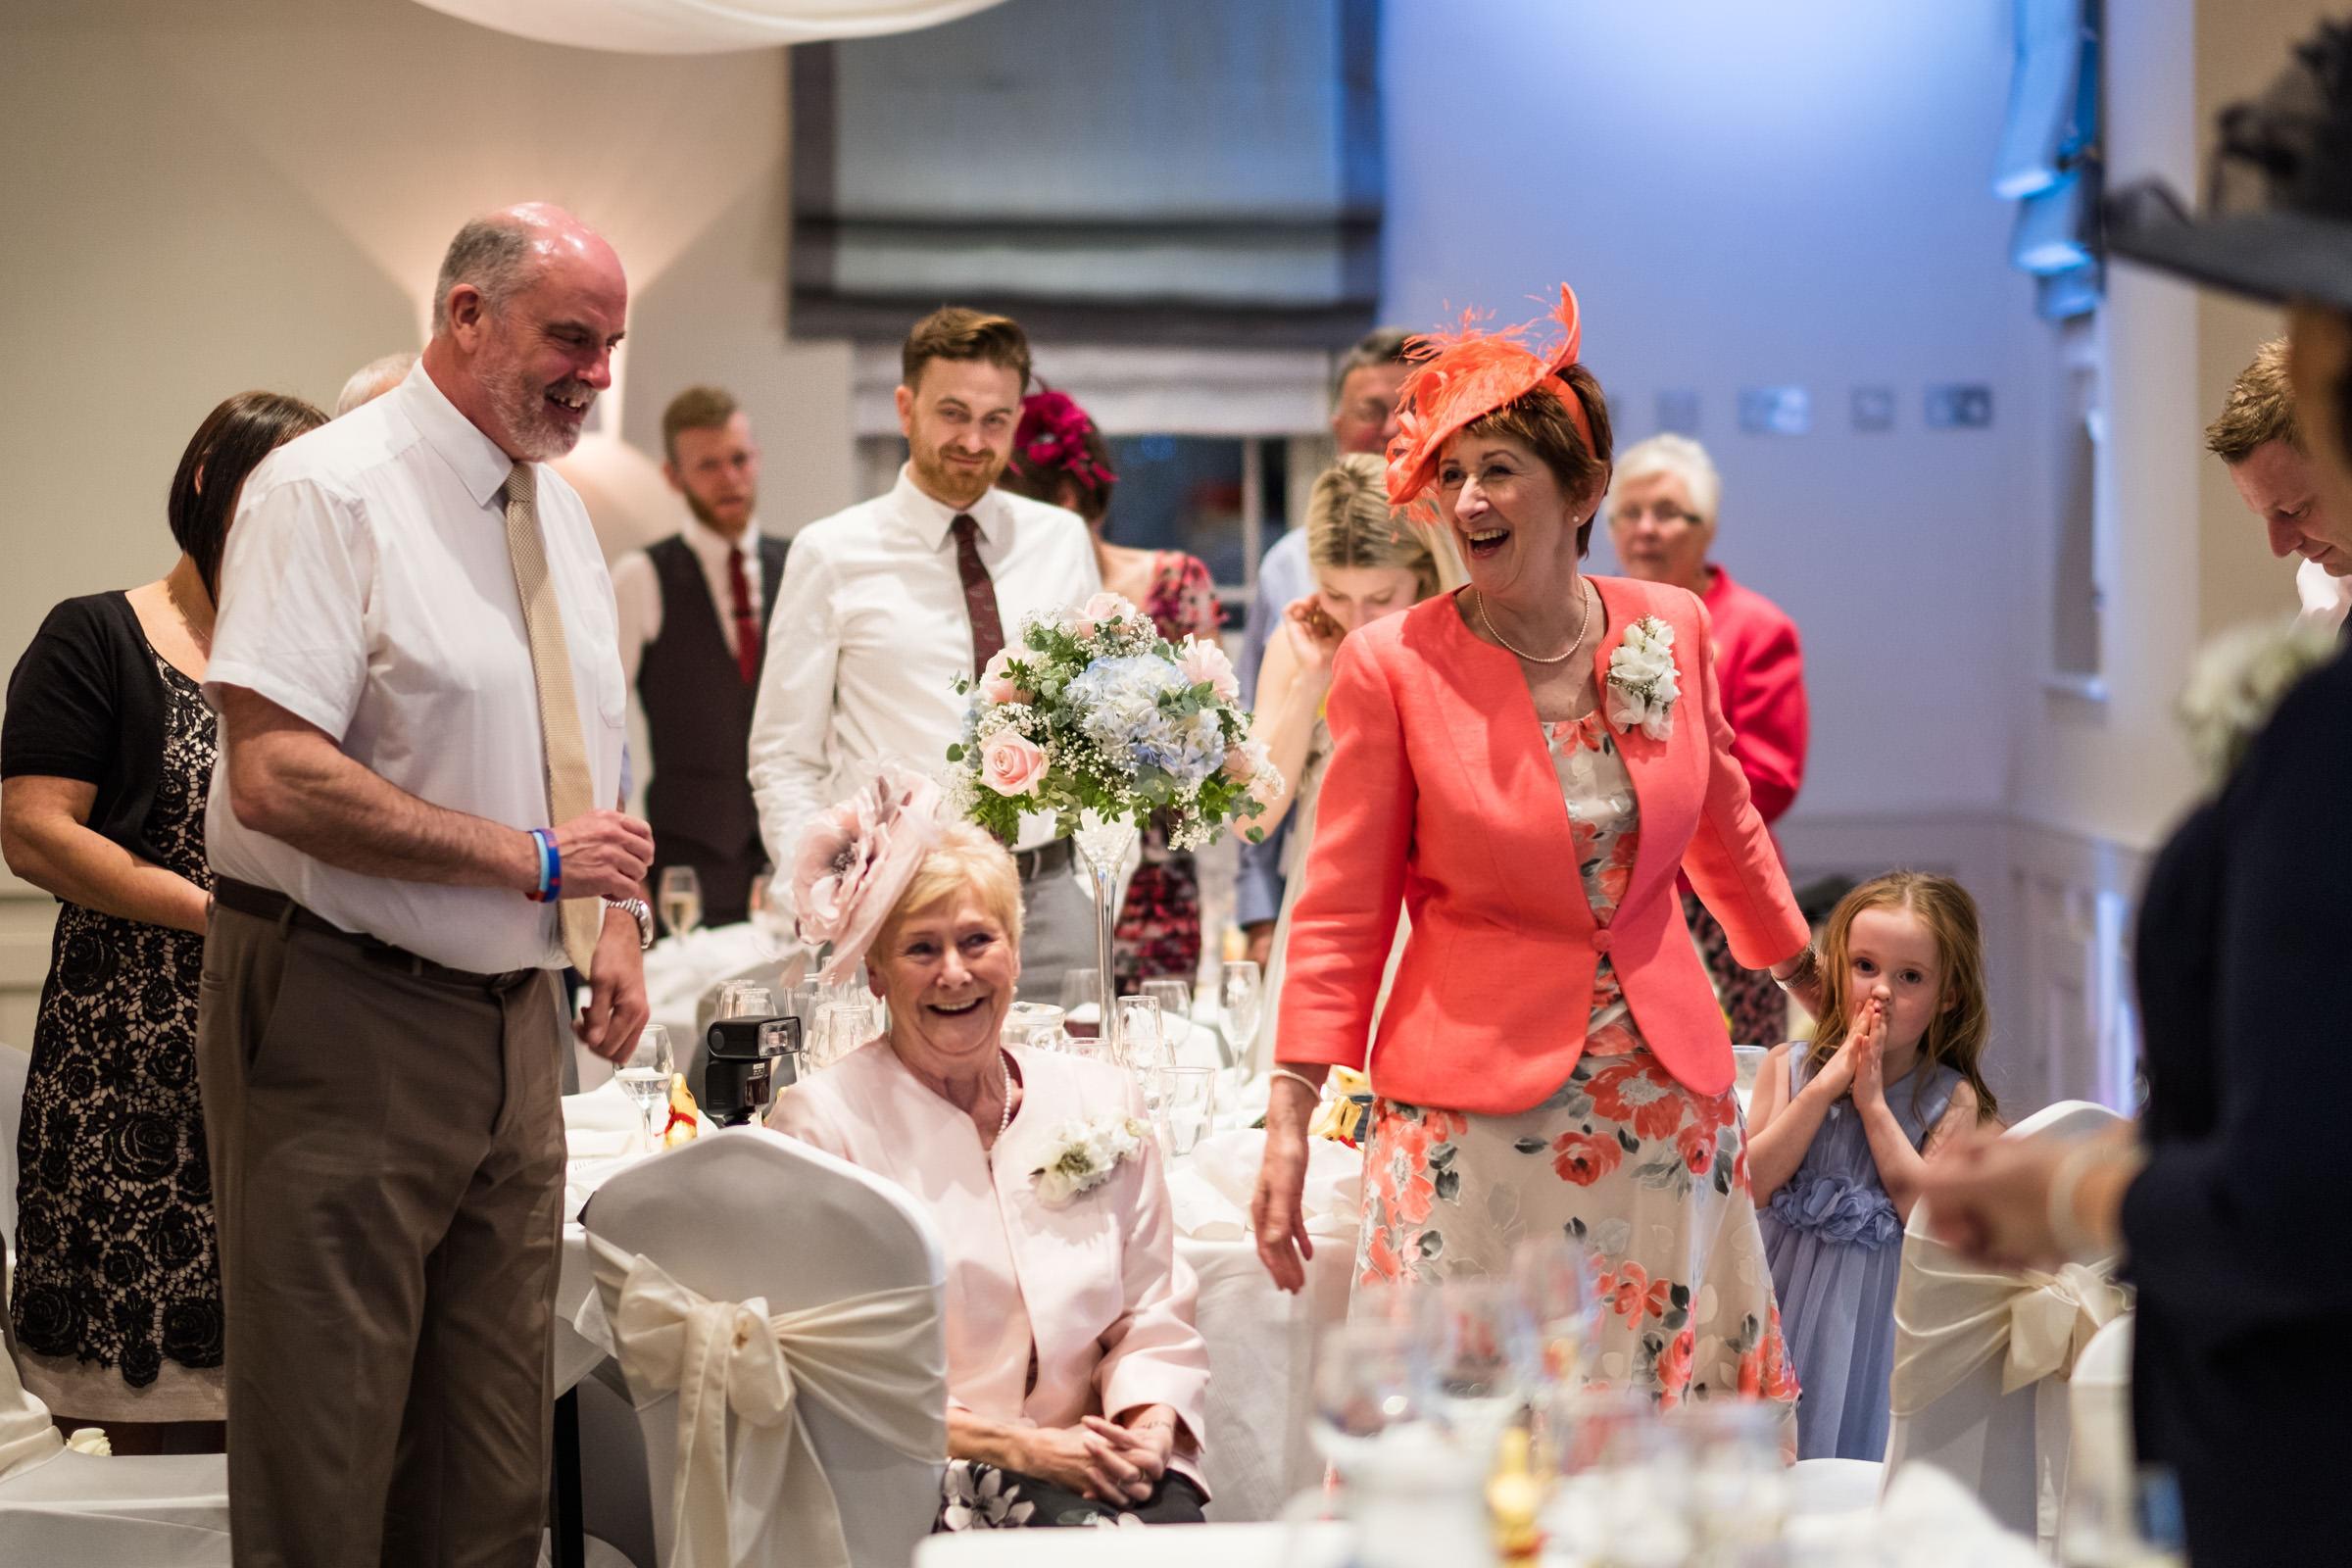 Donna & Nick's Wedding at Wotton House in Dorking 026.jpg